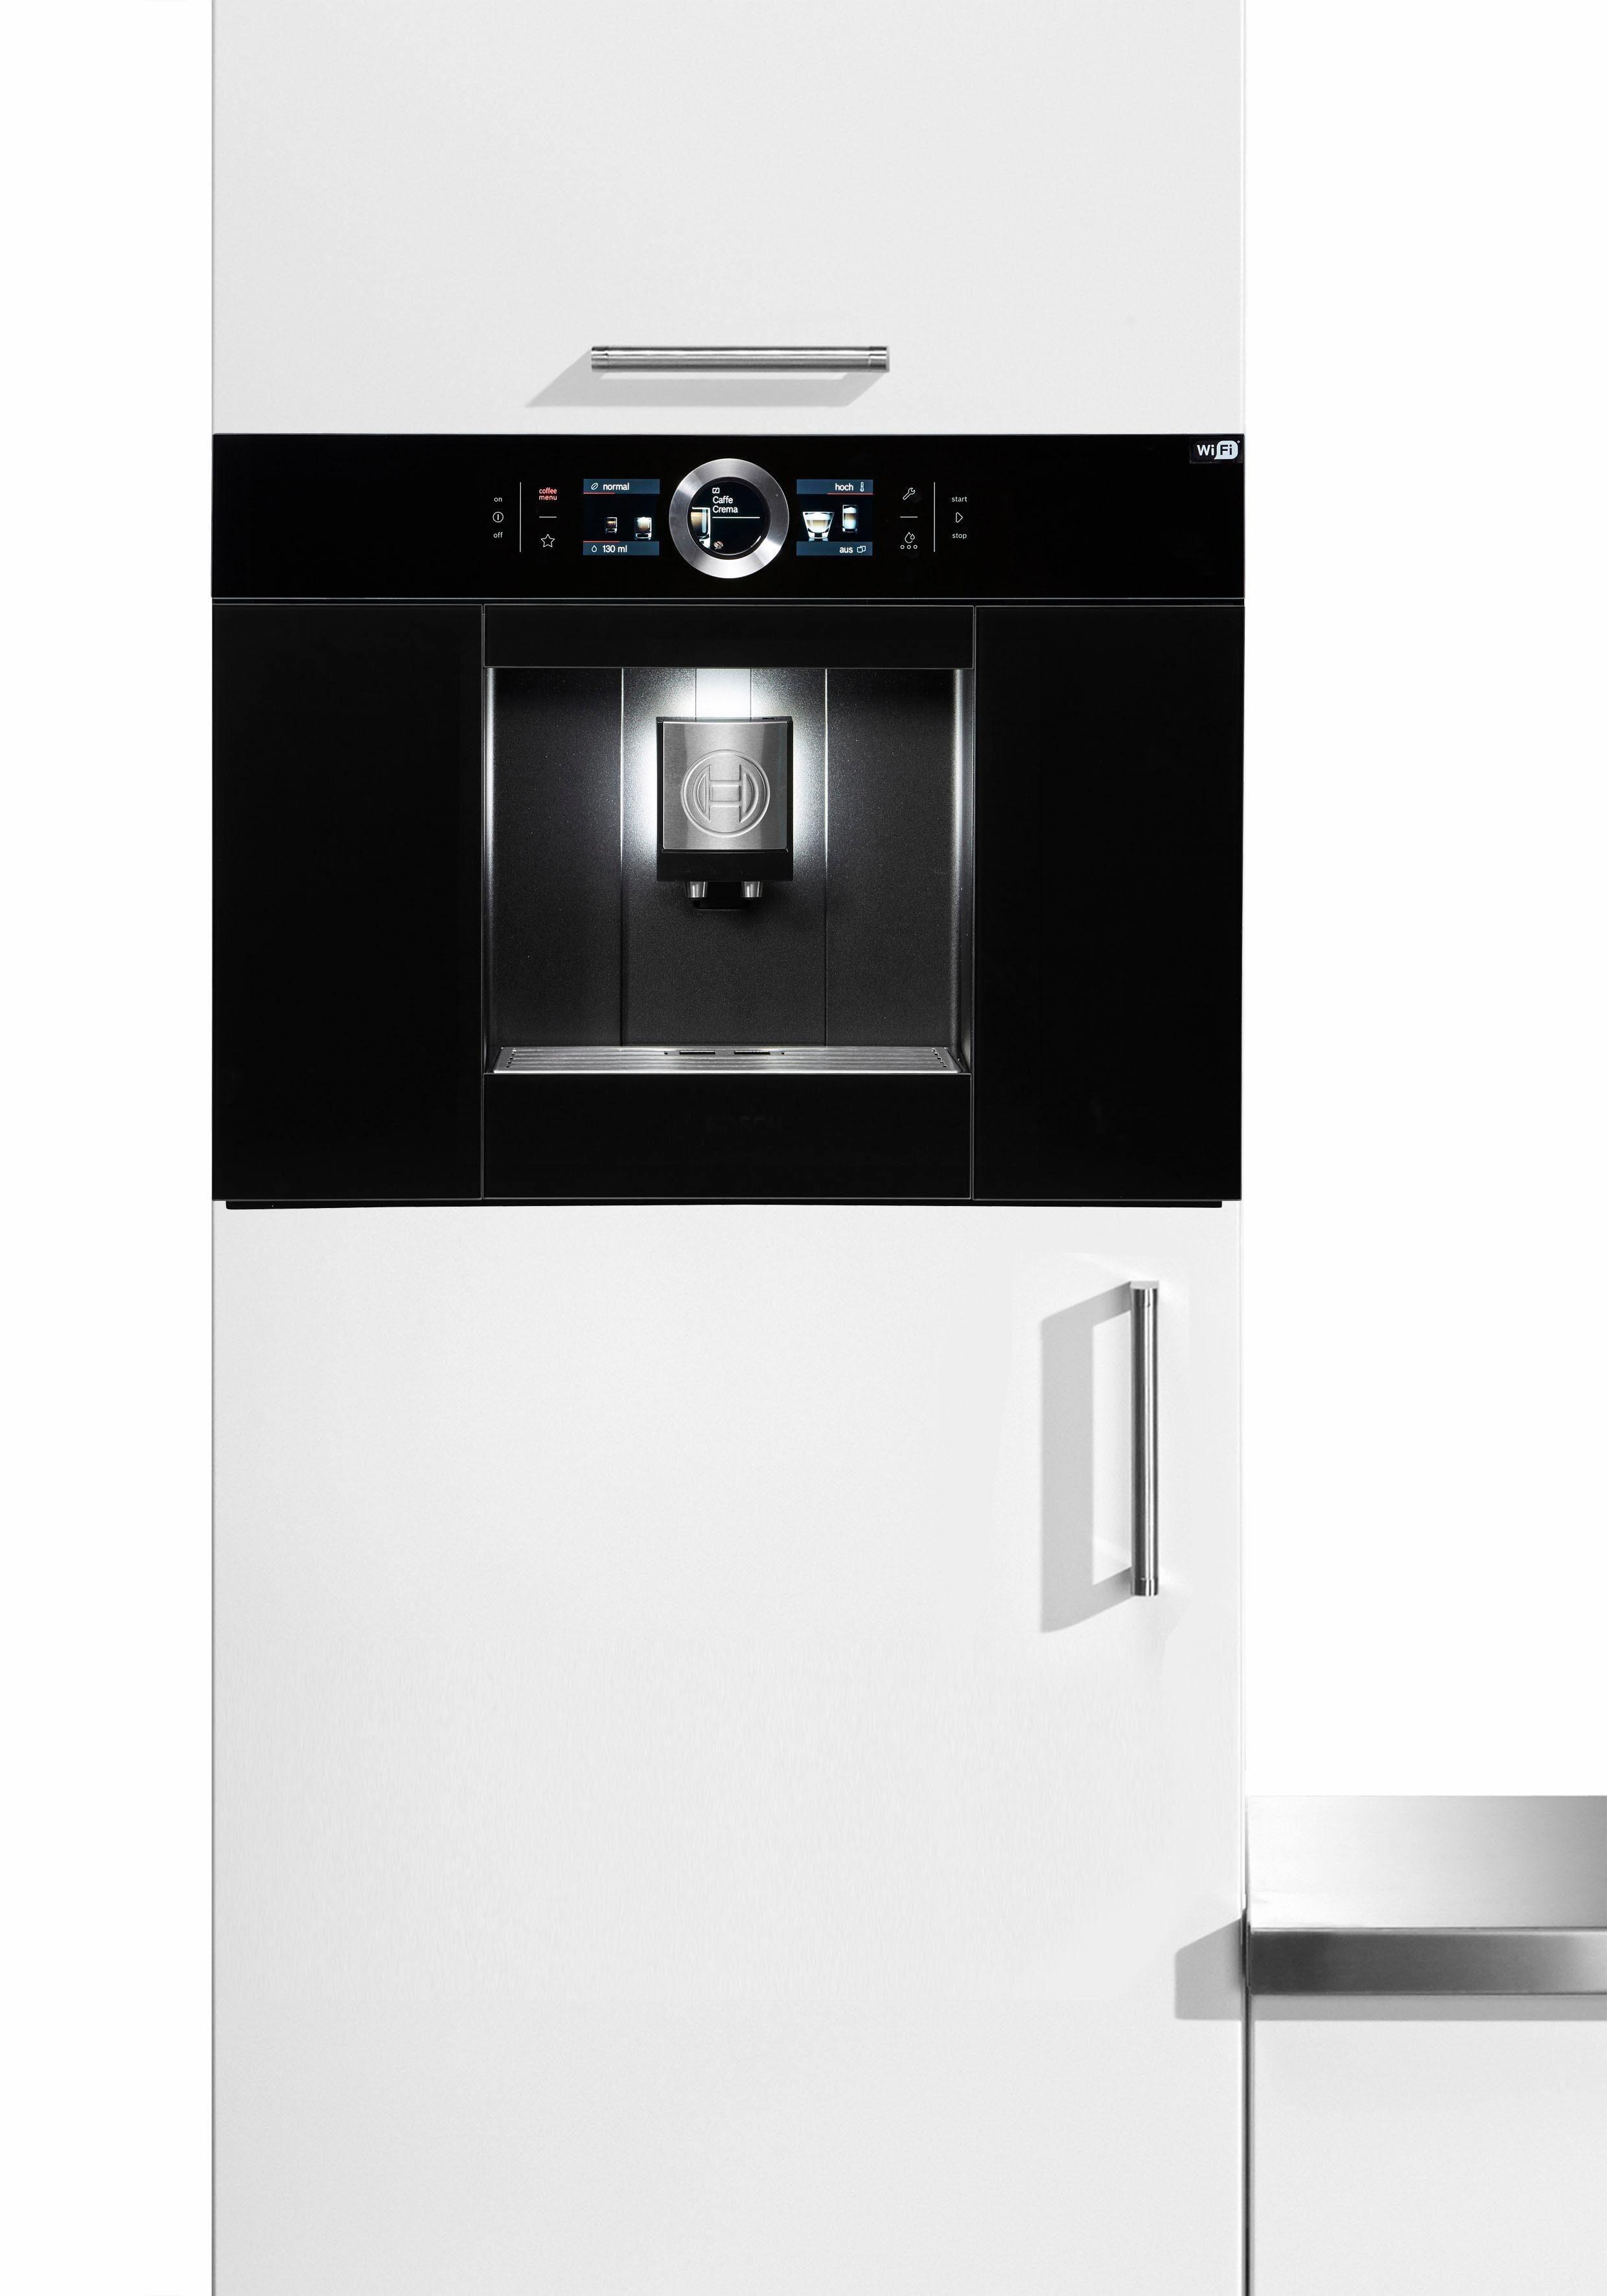 BOSCH Einbau-Kaffeevollautomaten CTL636EB6